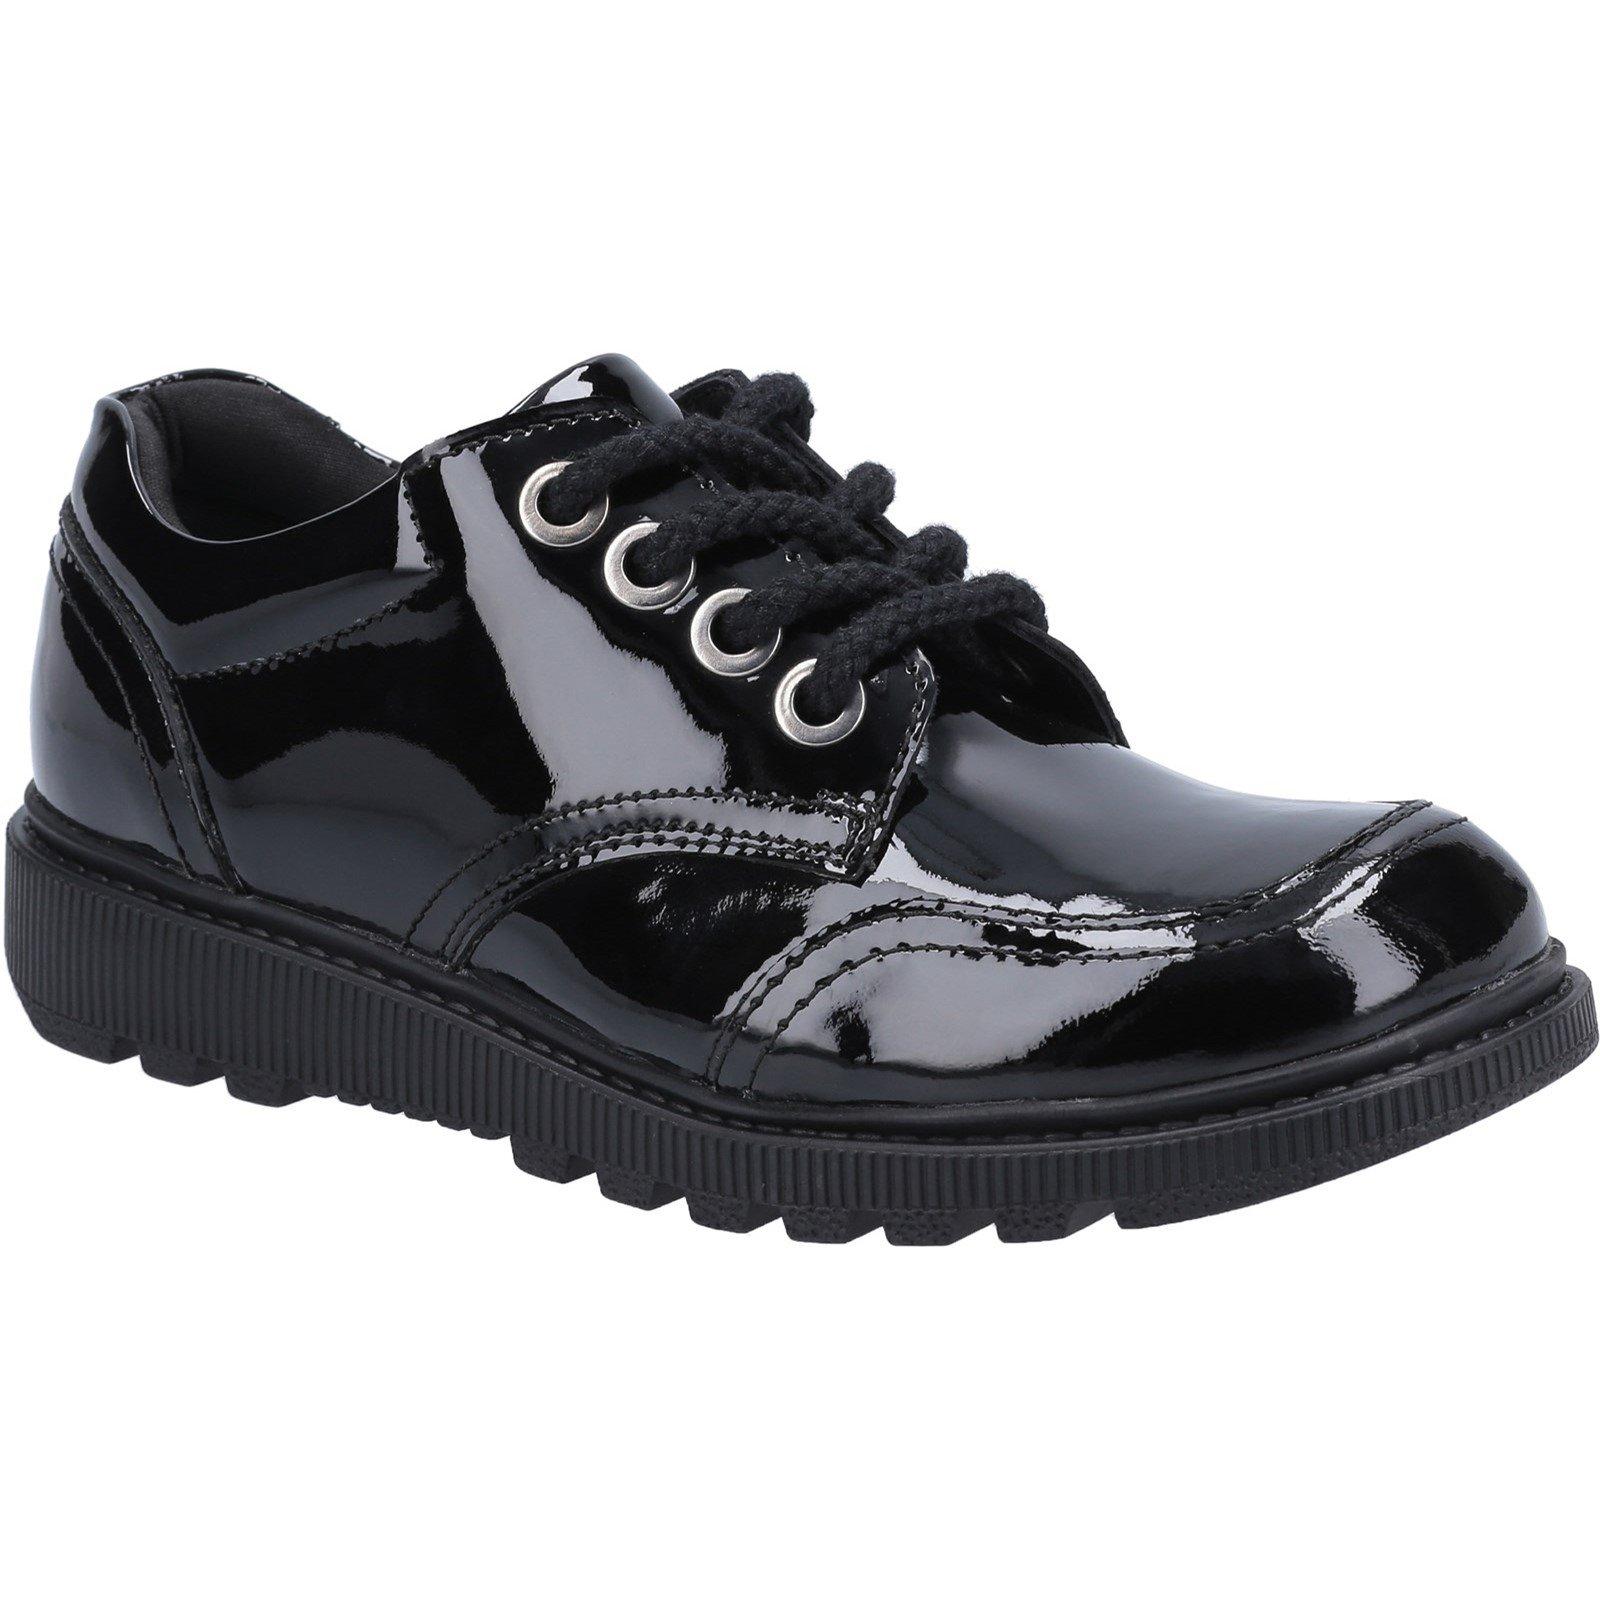 Hush Puppies Kid's Kiera Junior Patent School Shoe Black 30823 - Patent Black 11